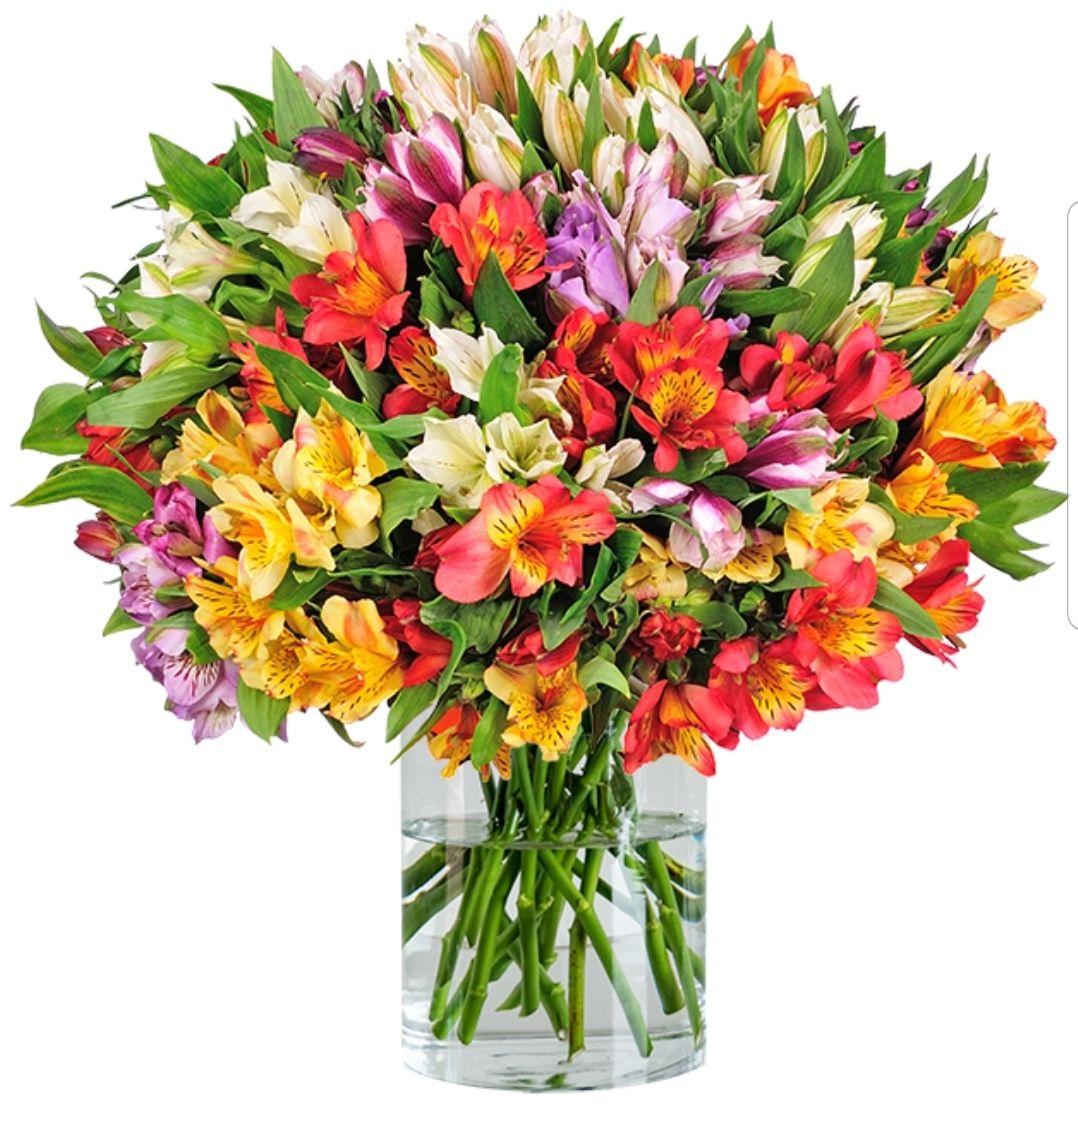 40 Inkalilien (Alstroemeria) bei BlumeIdeal + Shoop